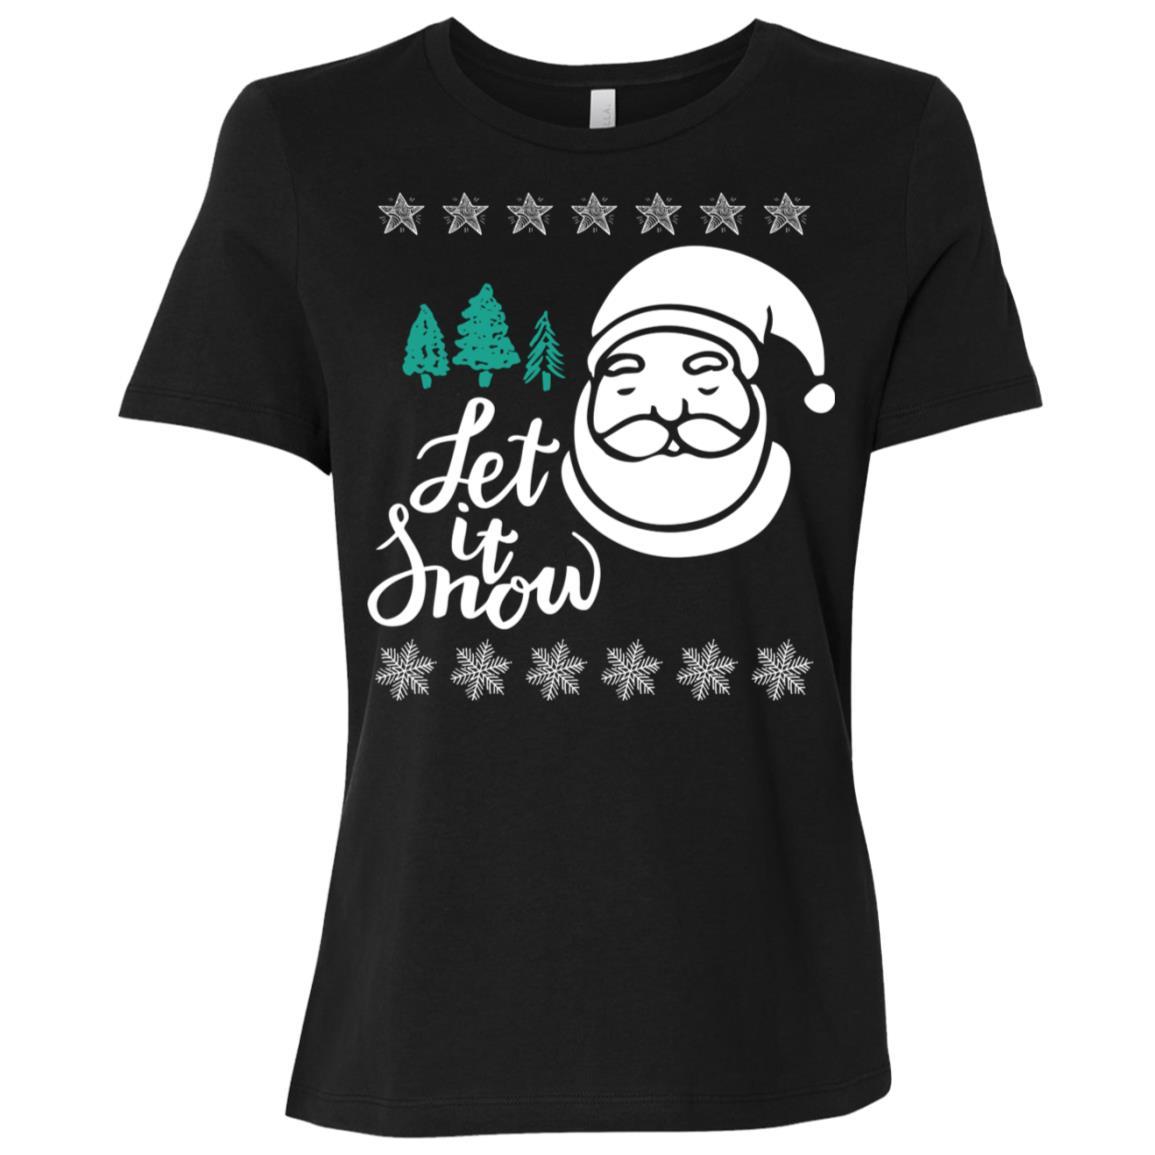 Let It Snow Santa Claus Statement Funny Christmas Women Short Sleeve T-Shirt